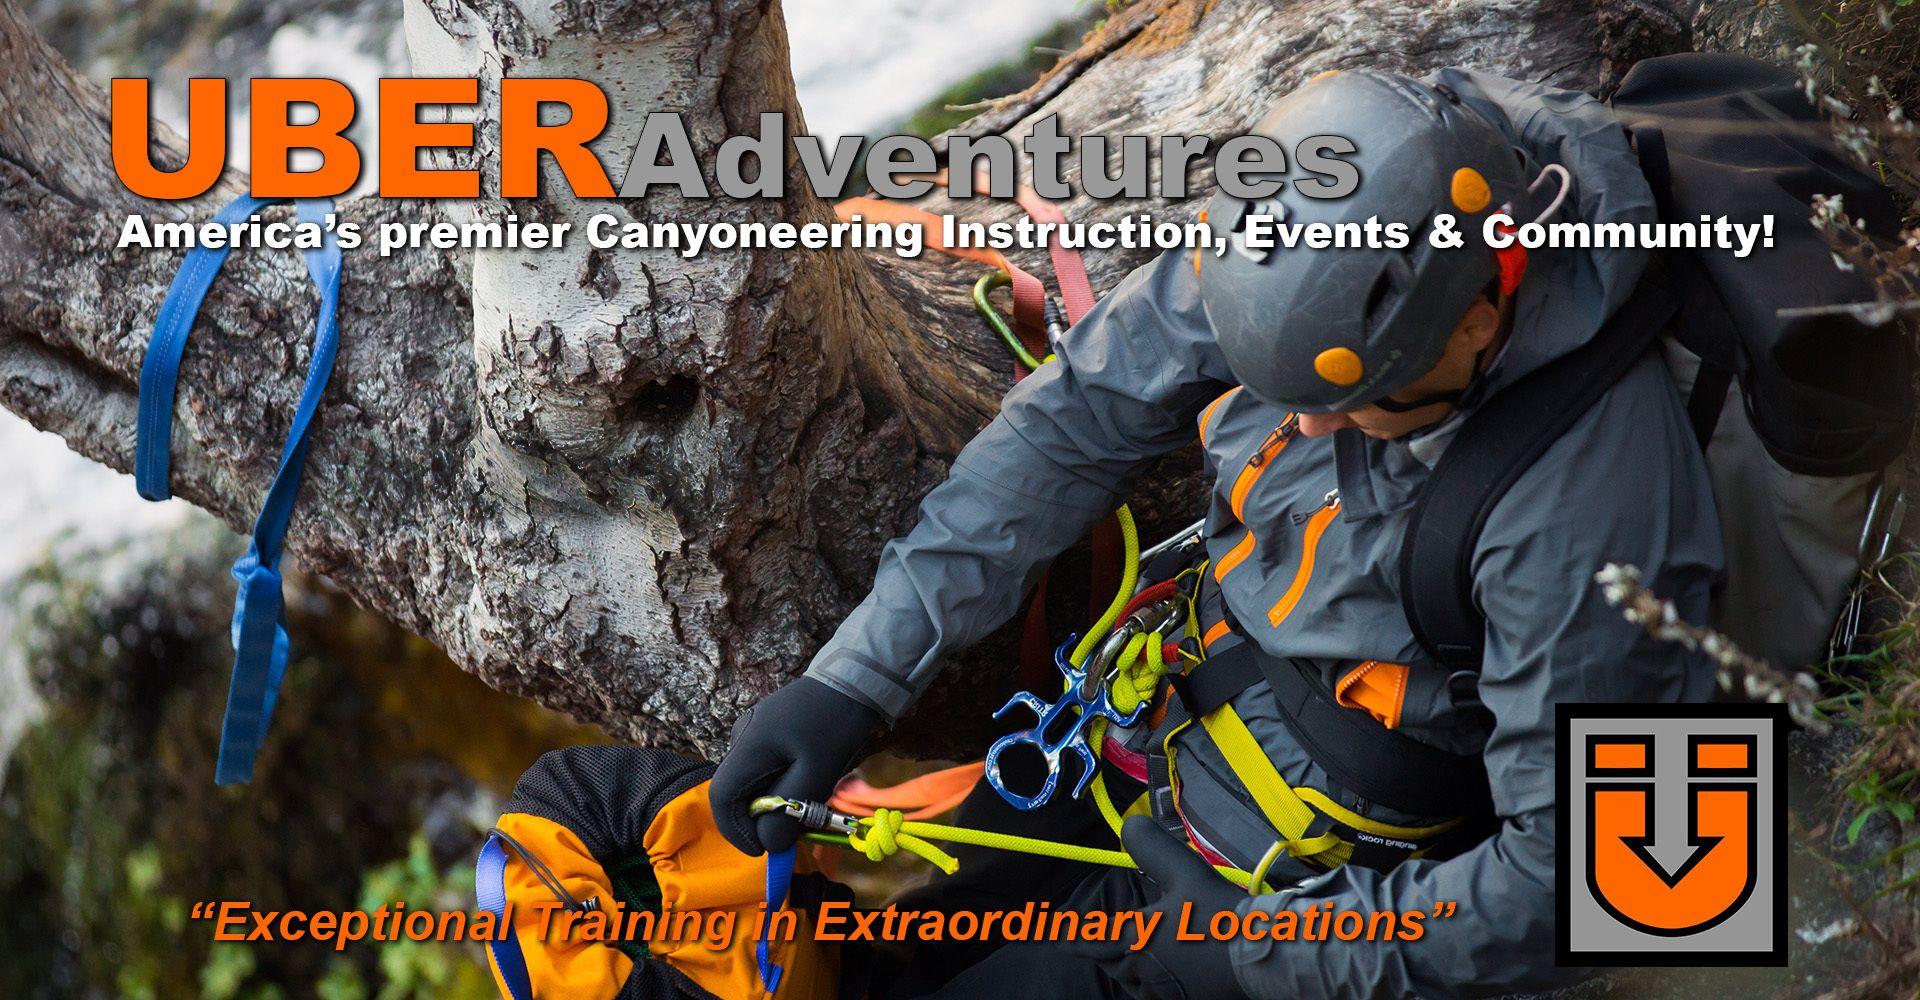 Bay Area Canyoneering